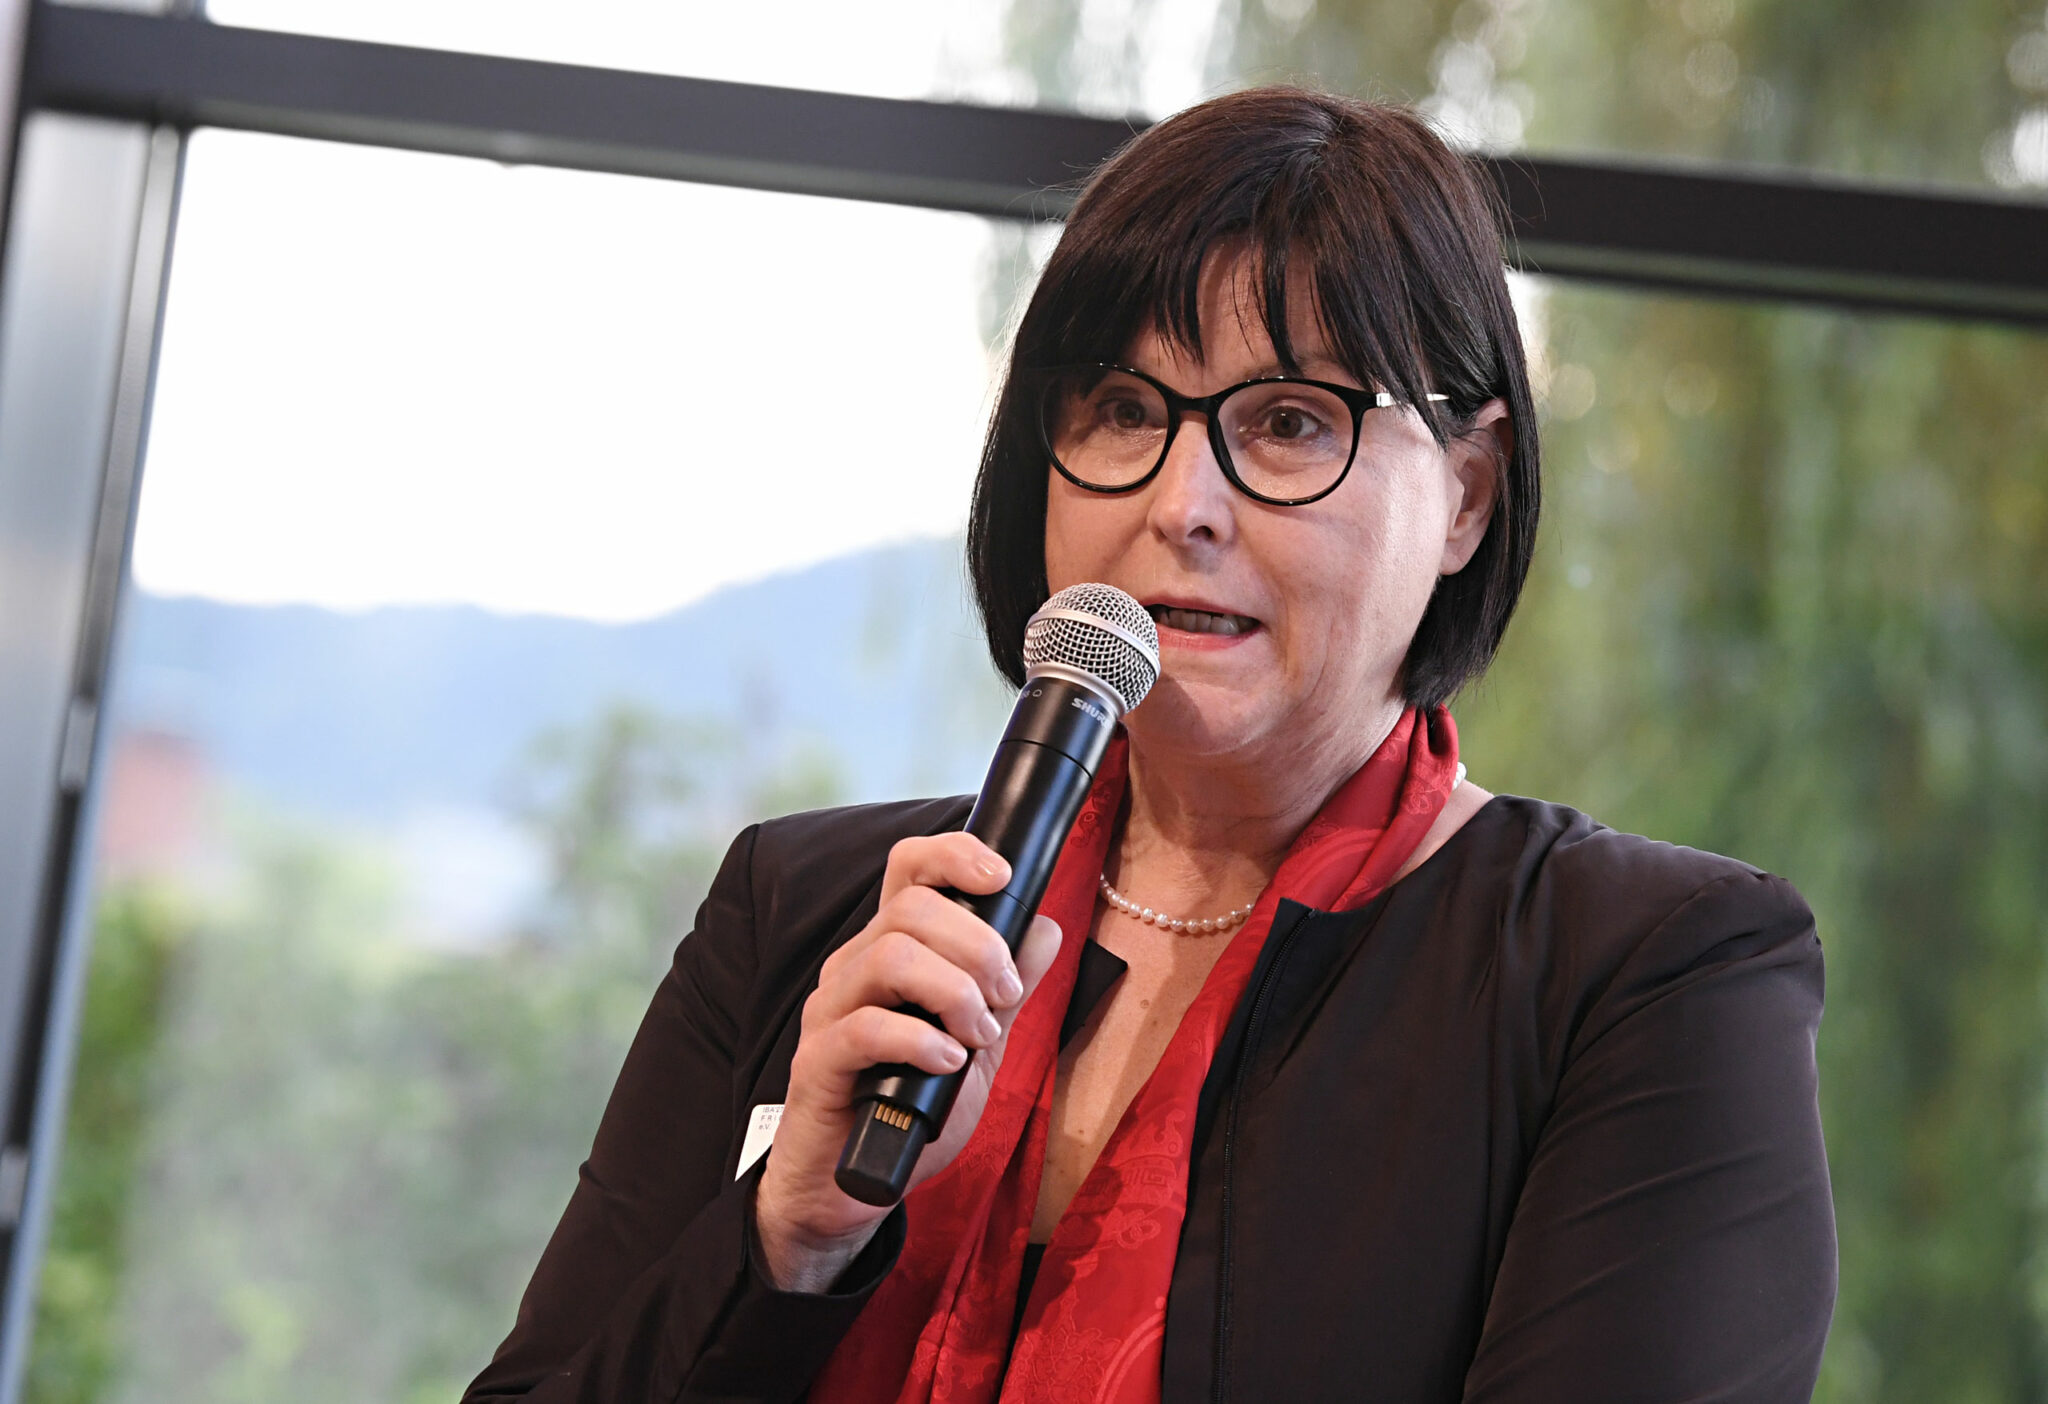 Karin Lang, Kaufmännische Geschäftsführerin der IBA'27 GmbH, bei der Gründungsveranstaltung der IBA'27 Friends e.V. (Bild: IBA'27 / F. Kraufmann)